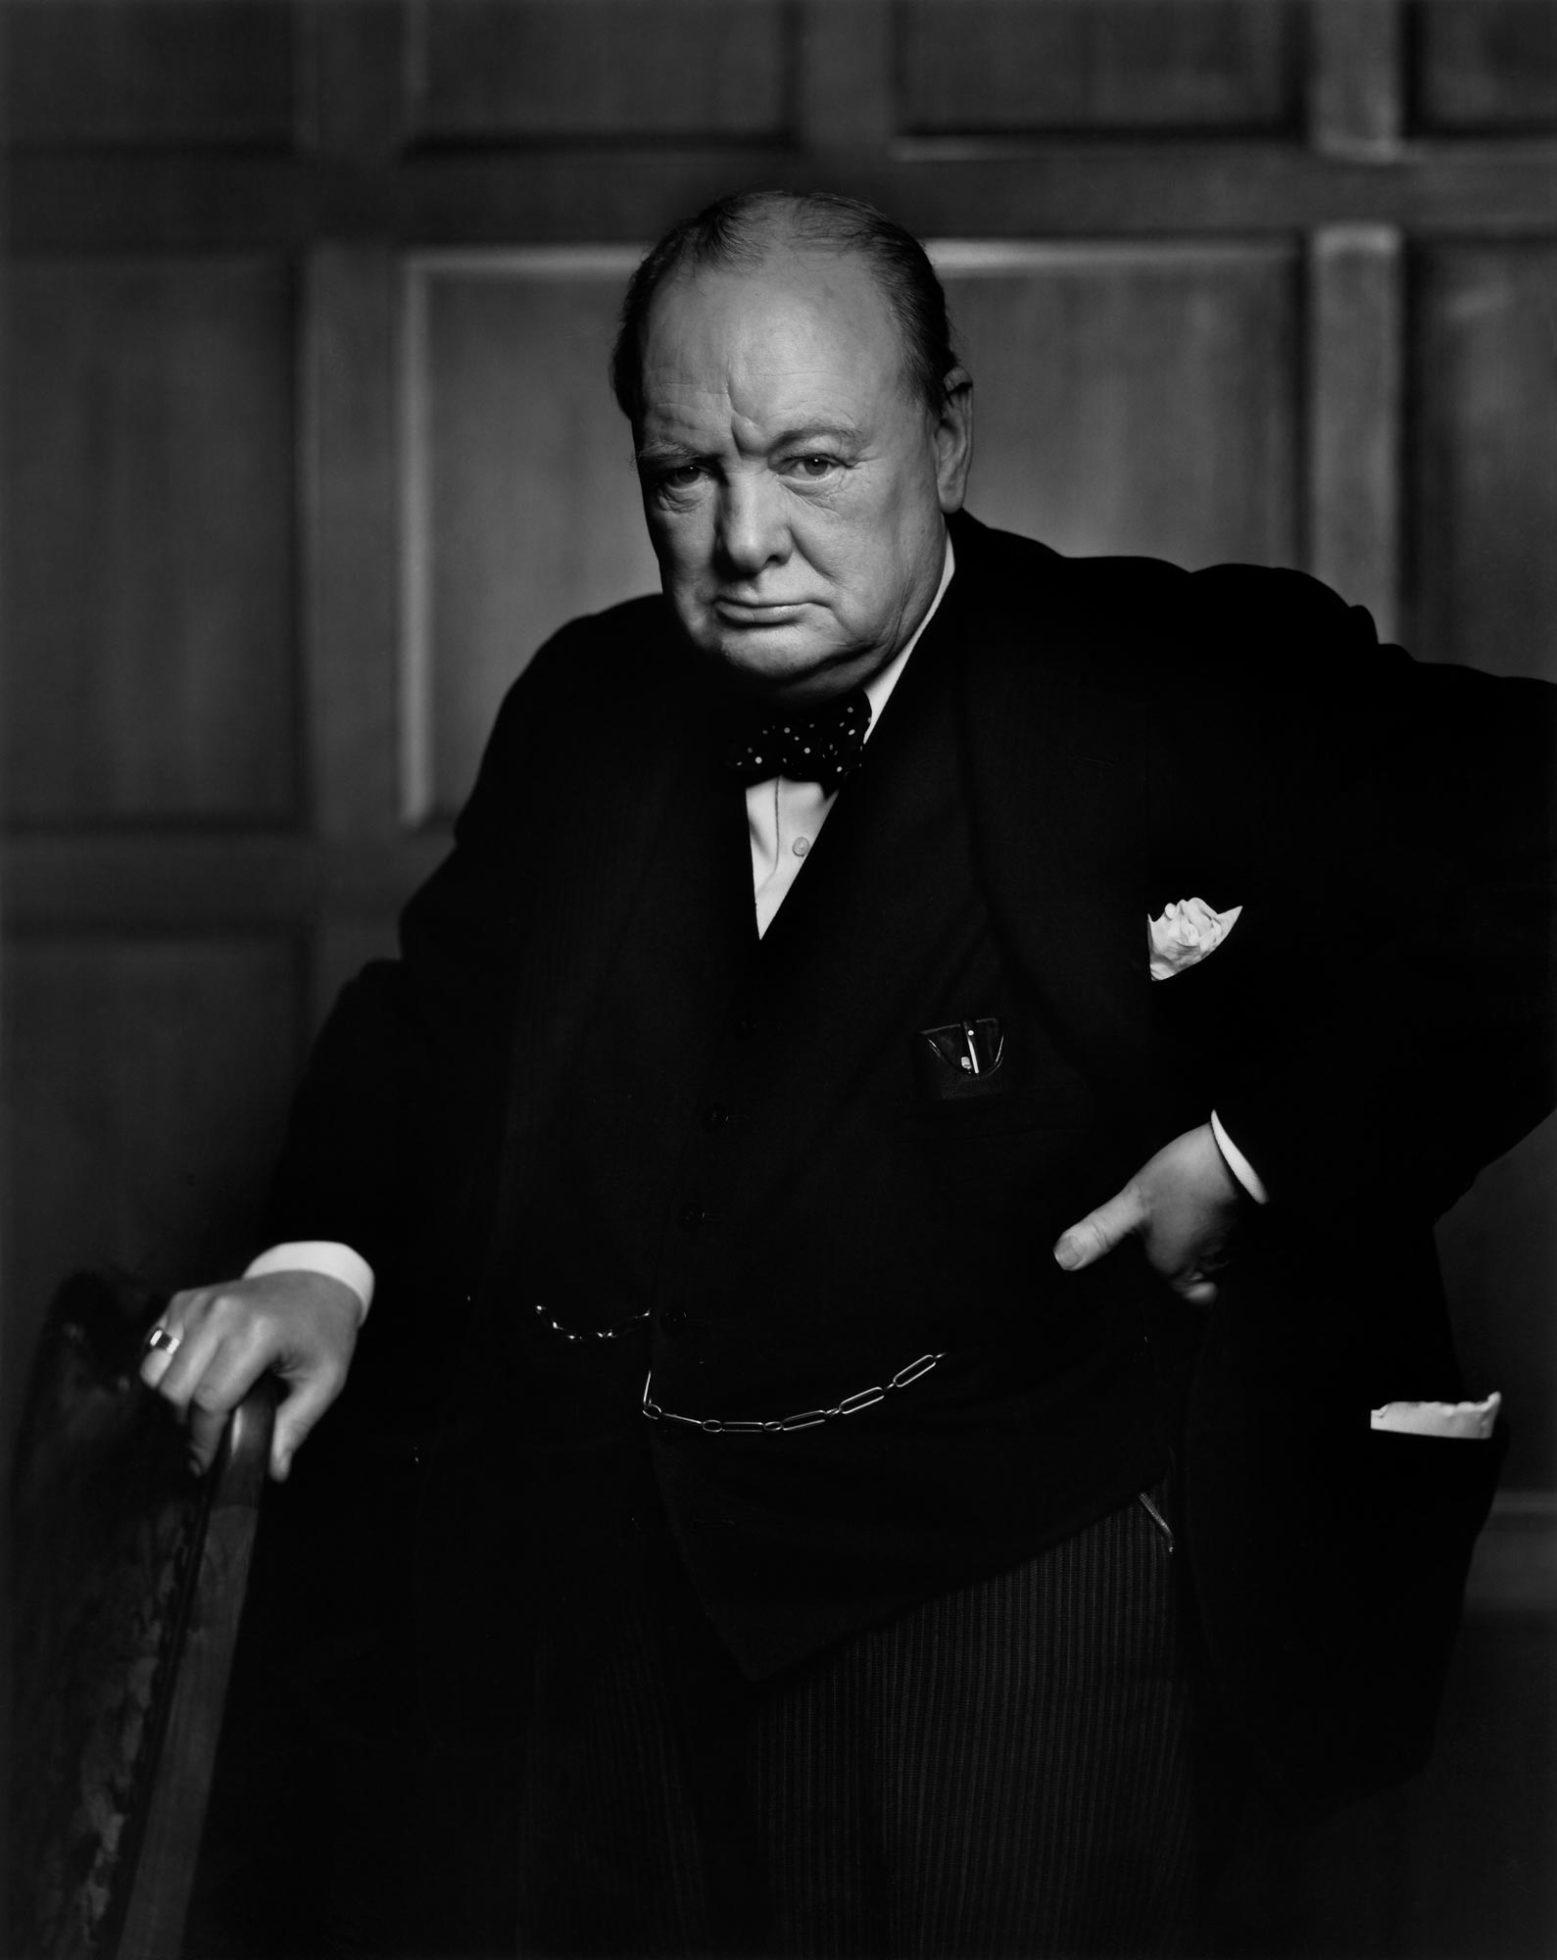 Iconic: Winston Churchill by Yousuf Karsh (1941)